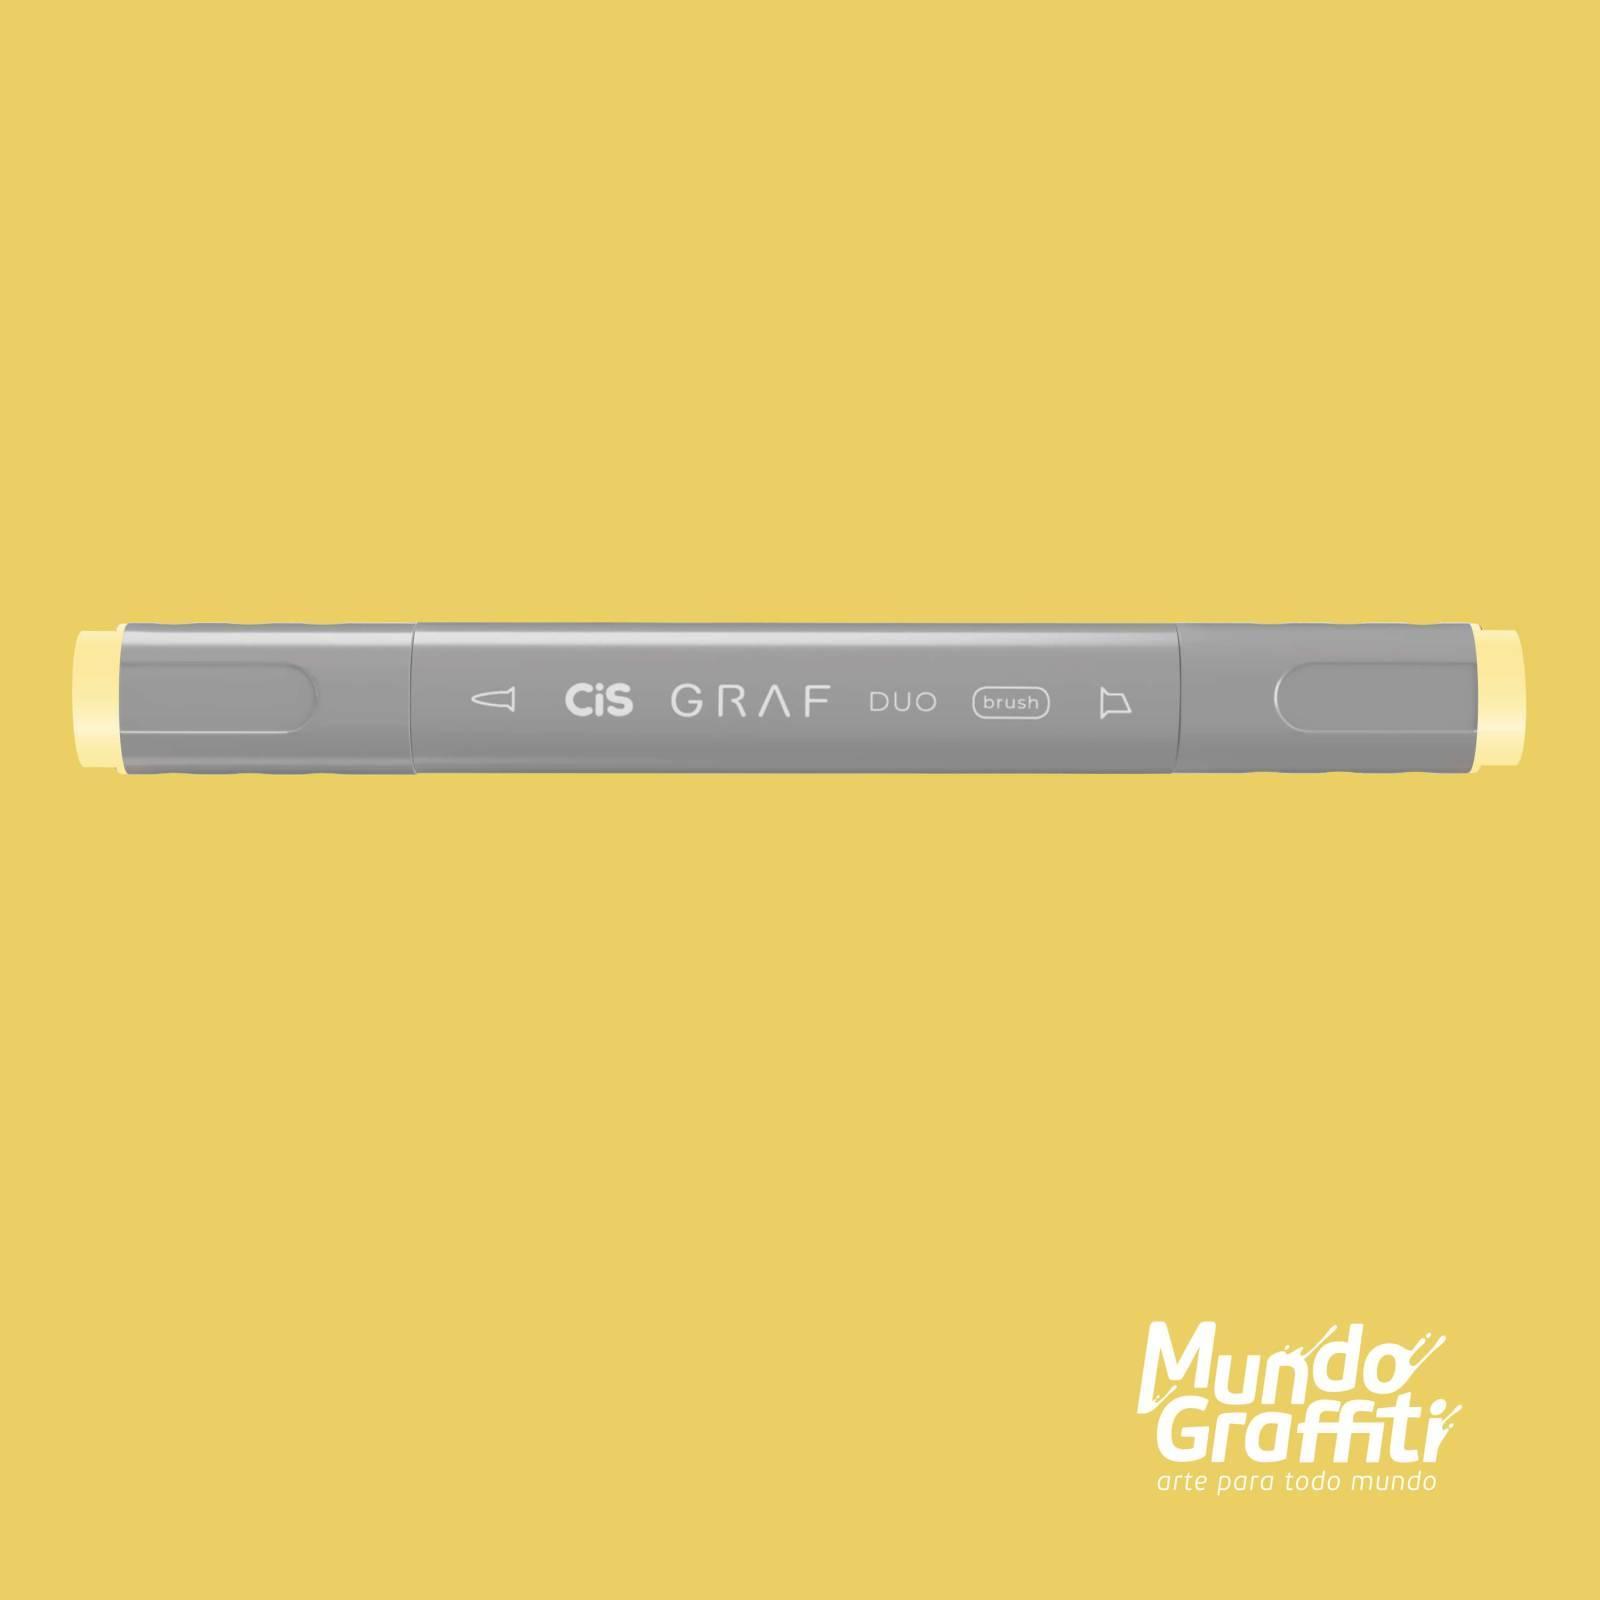 Marcador Cis Graf Duo Brush Brown Grey 104 - Mundo Graffiti